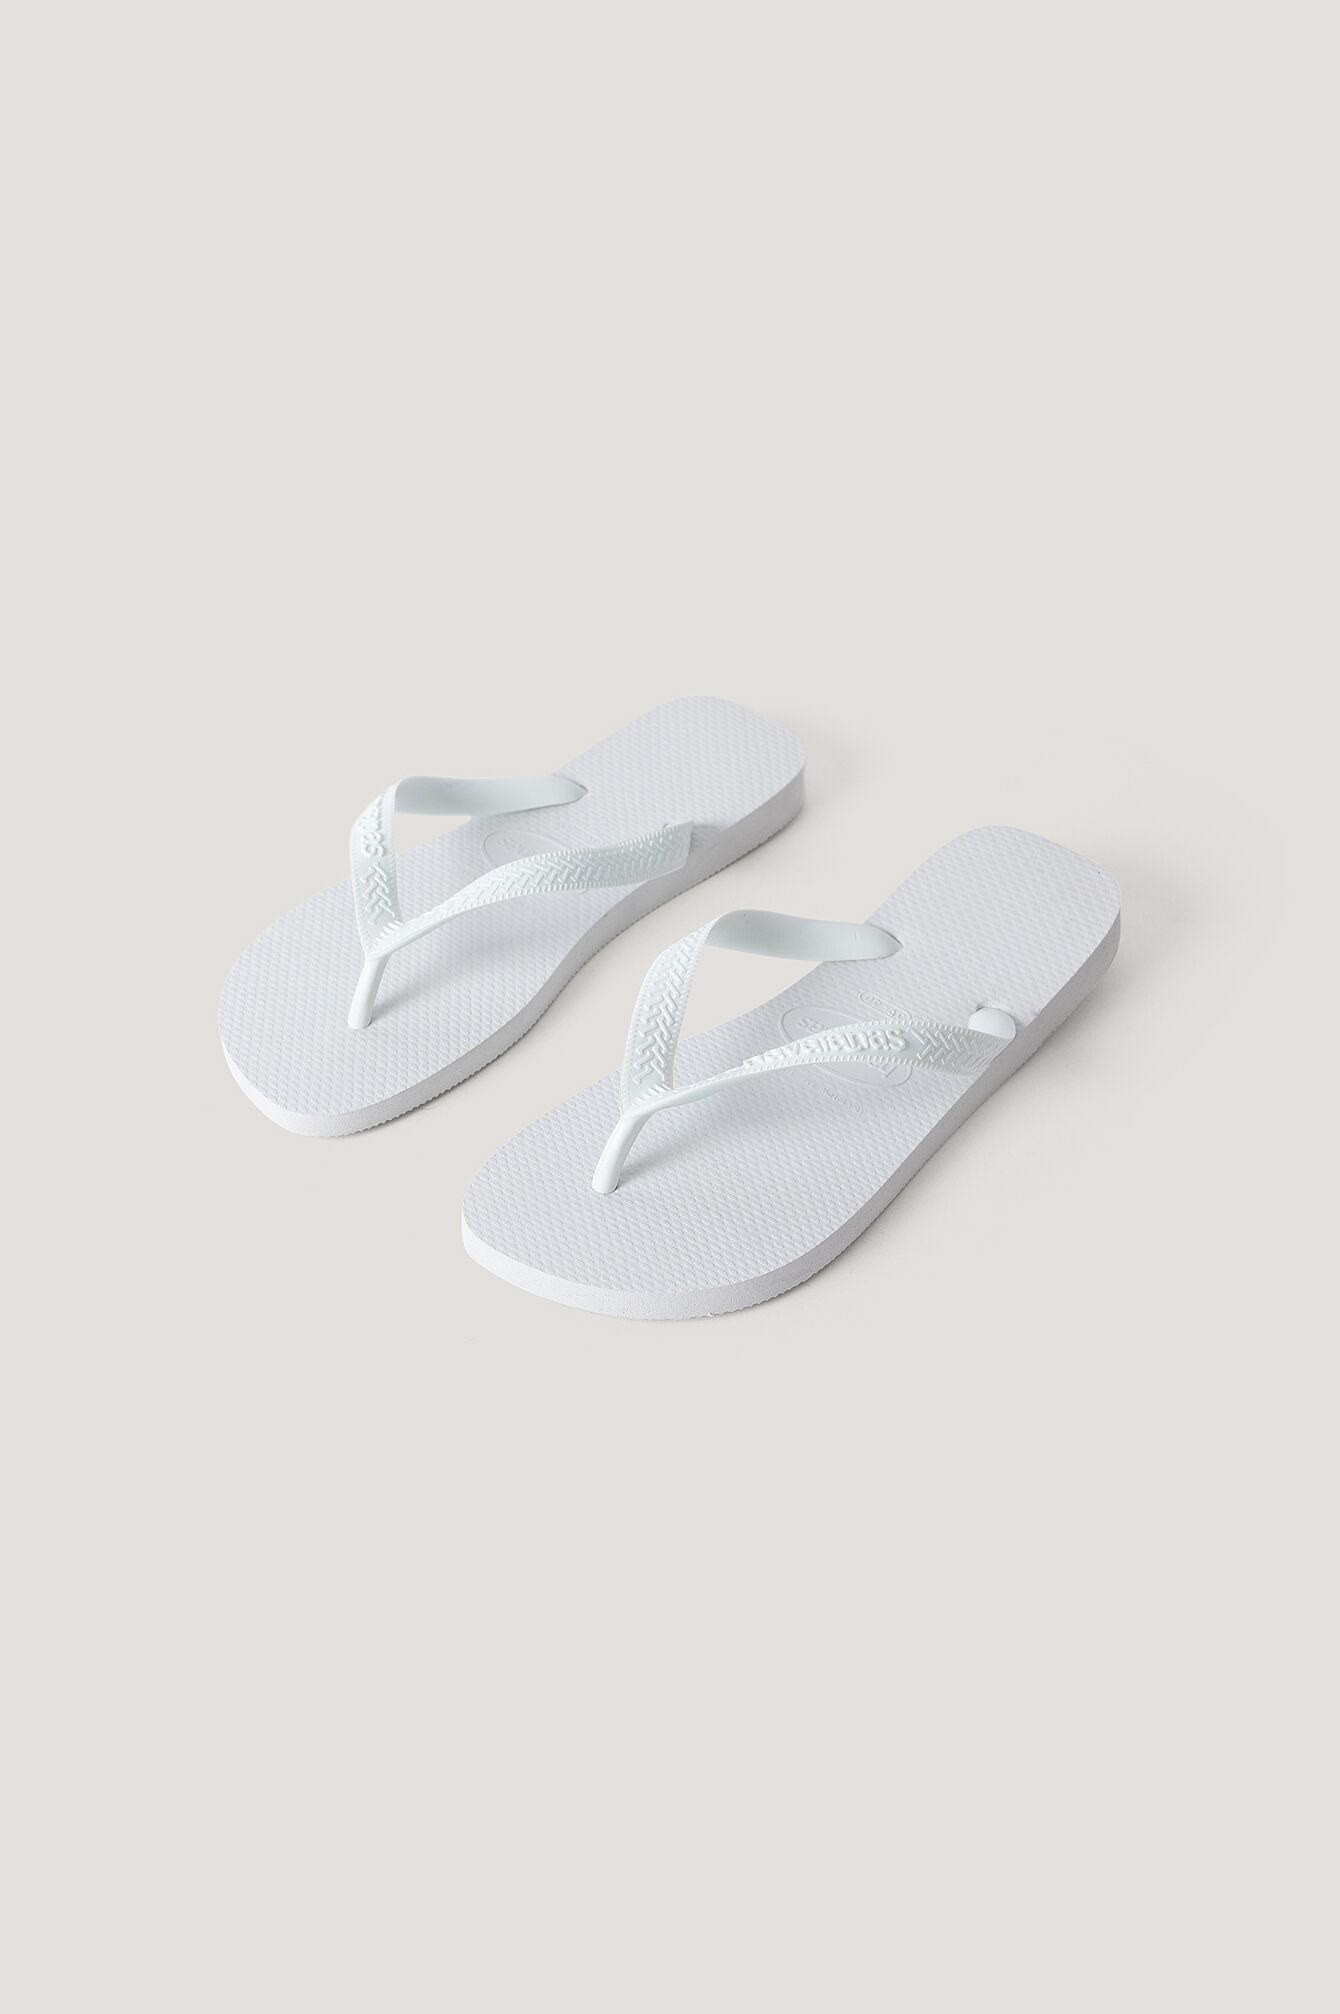 Havaianas Top Flip Flop - White